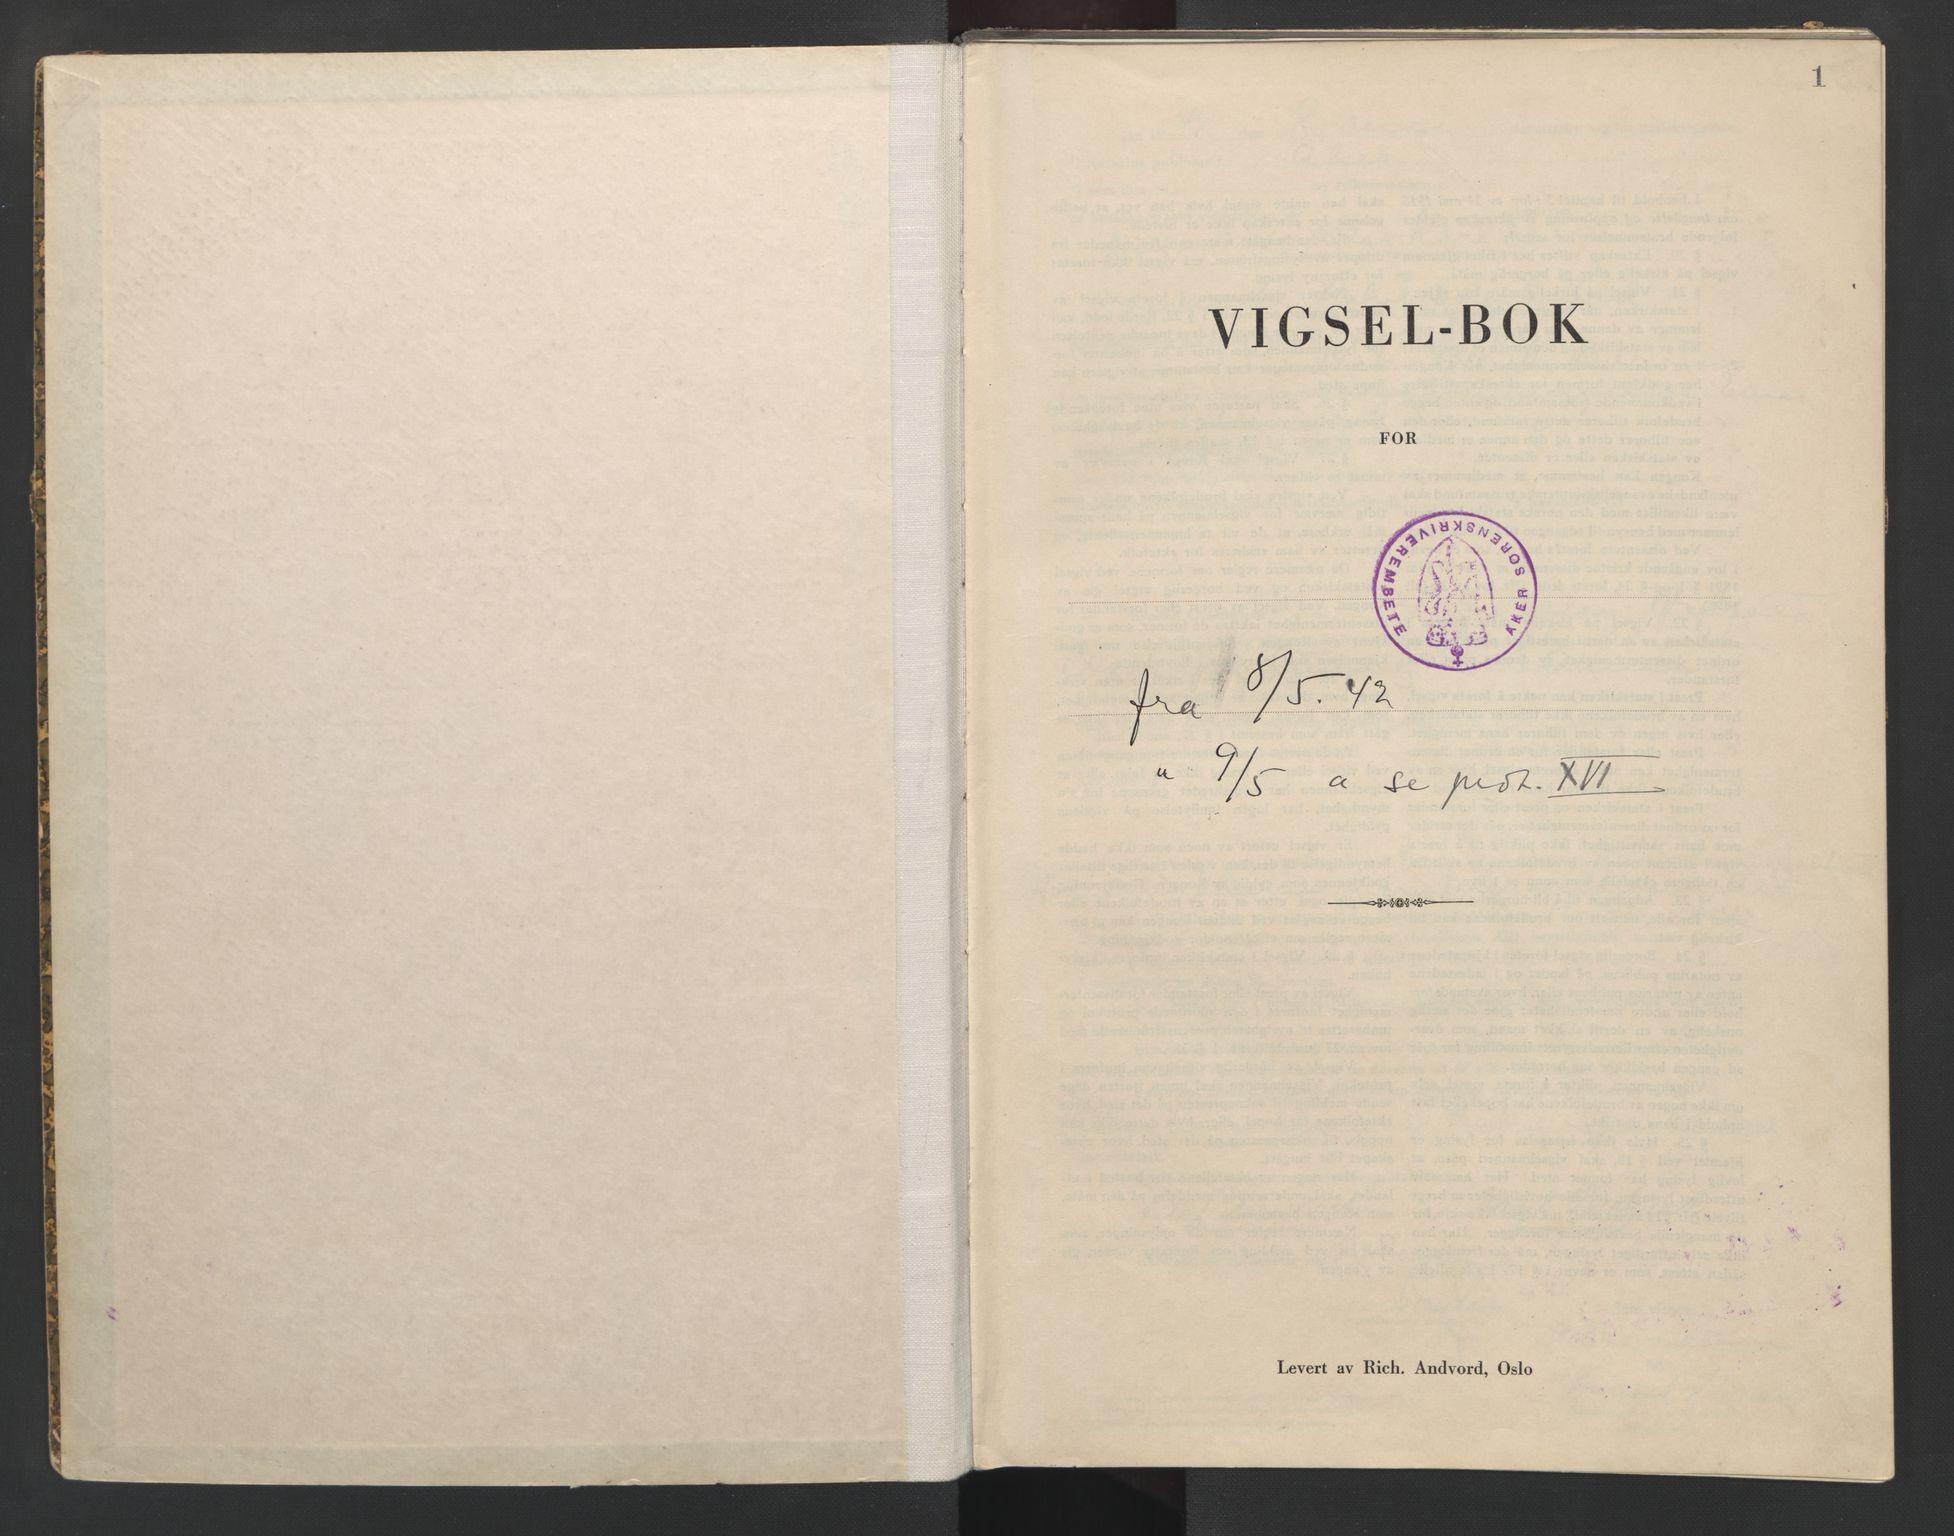 SAO, Aker sorenskriveri, L/Lc/Lcb/L0015: Vigselprotokoll, 1942, s. 1